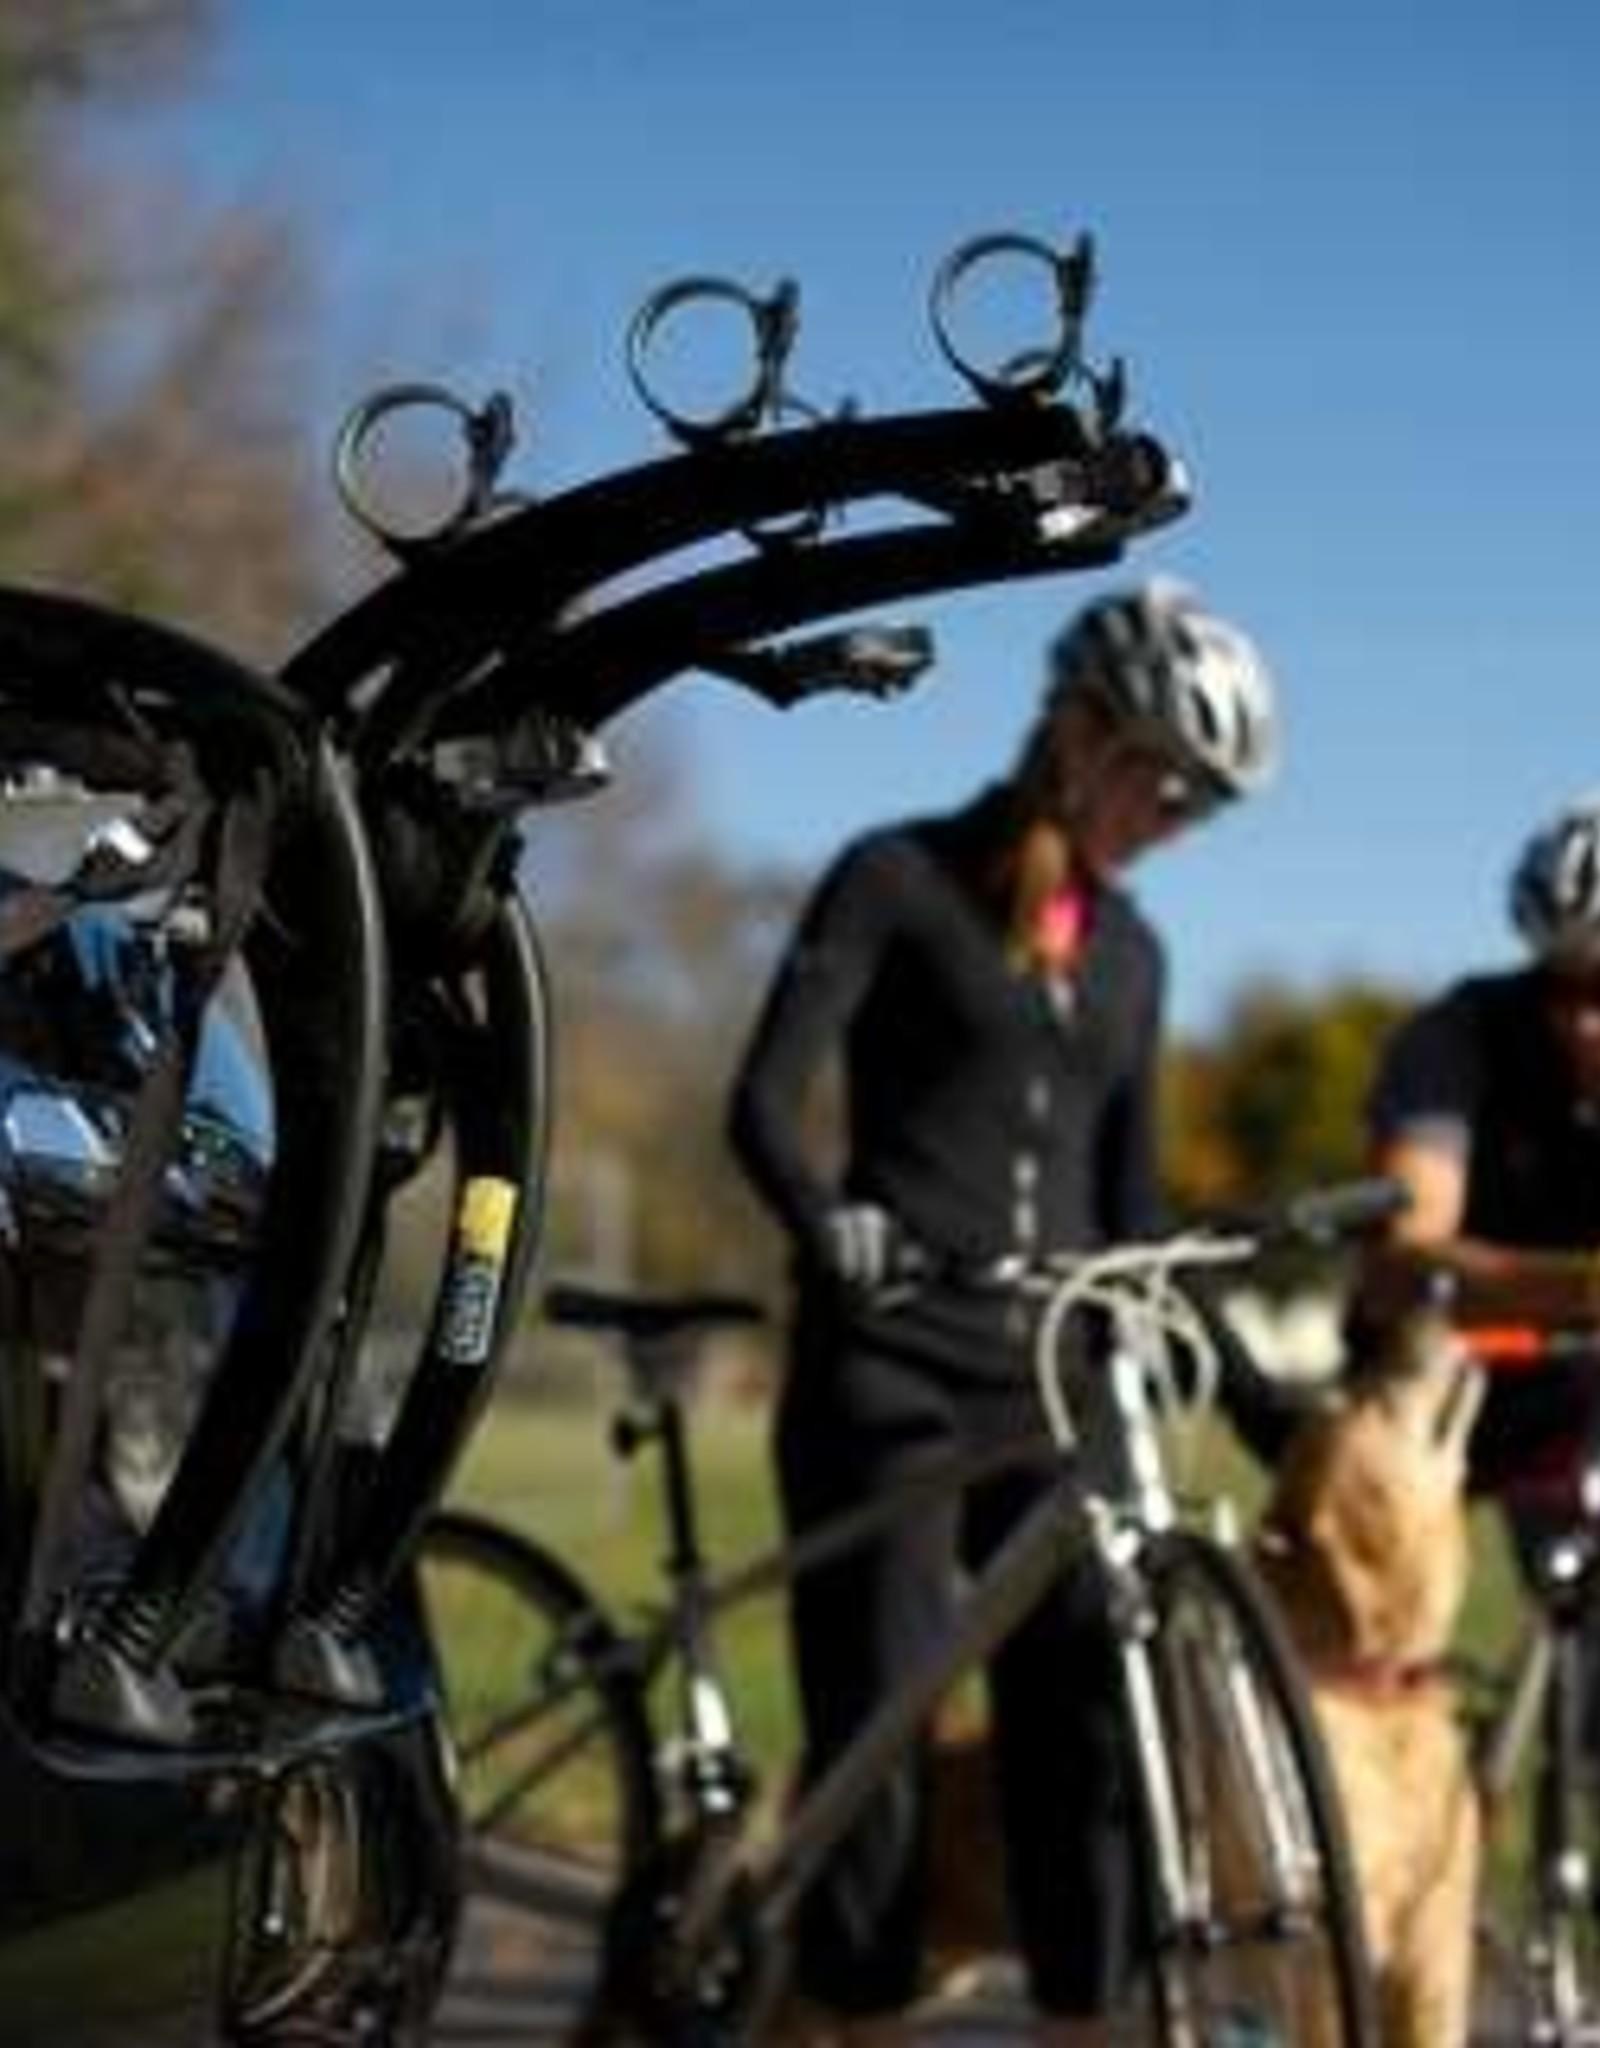 Saris Saris Bones Trunk Rack: 3 Bike, Black AR6121